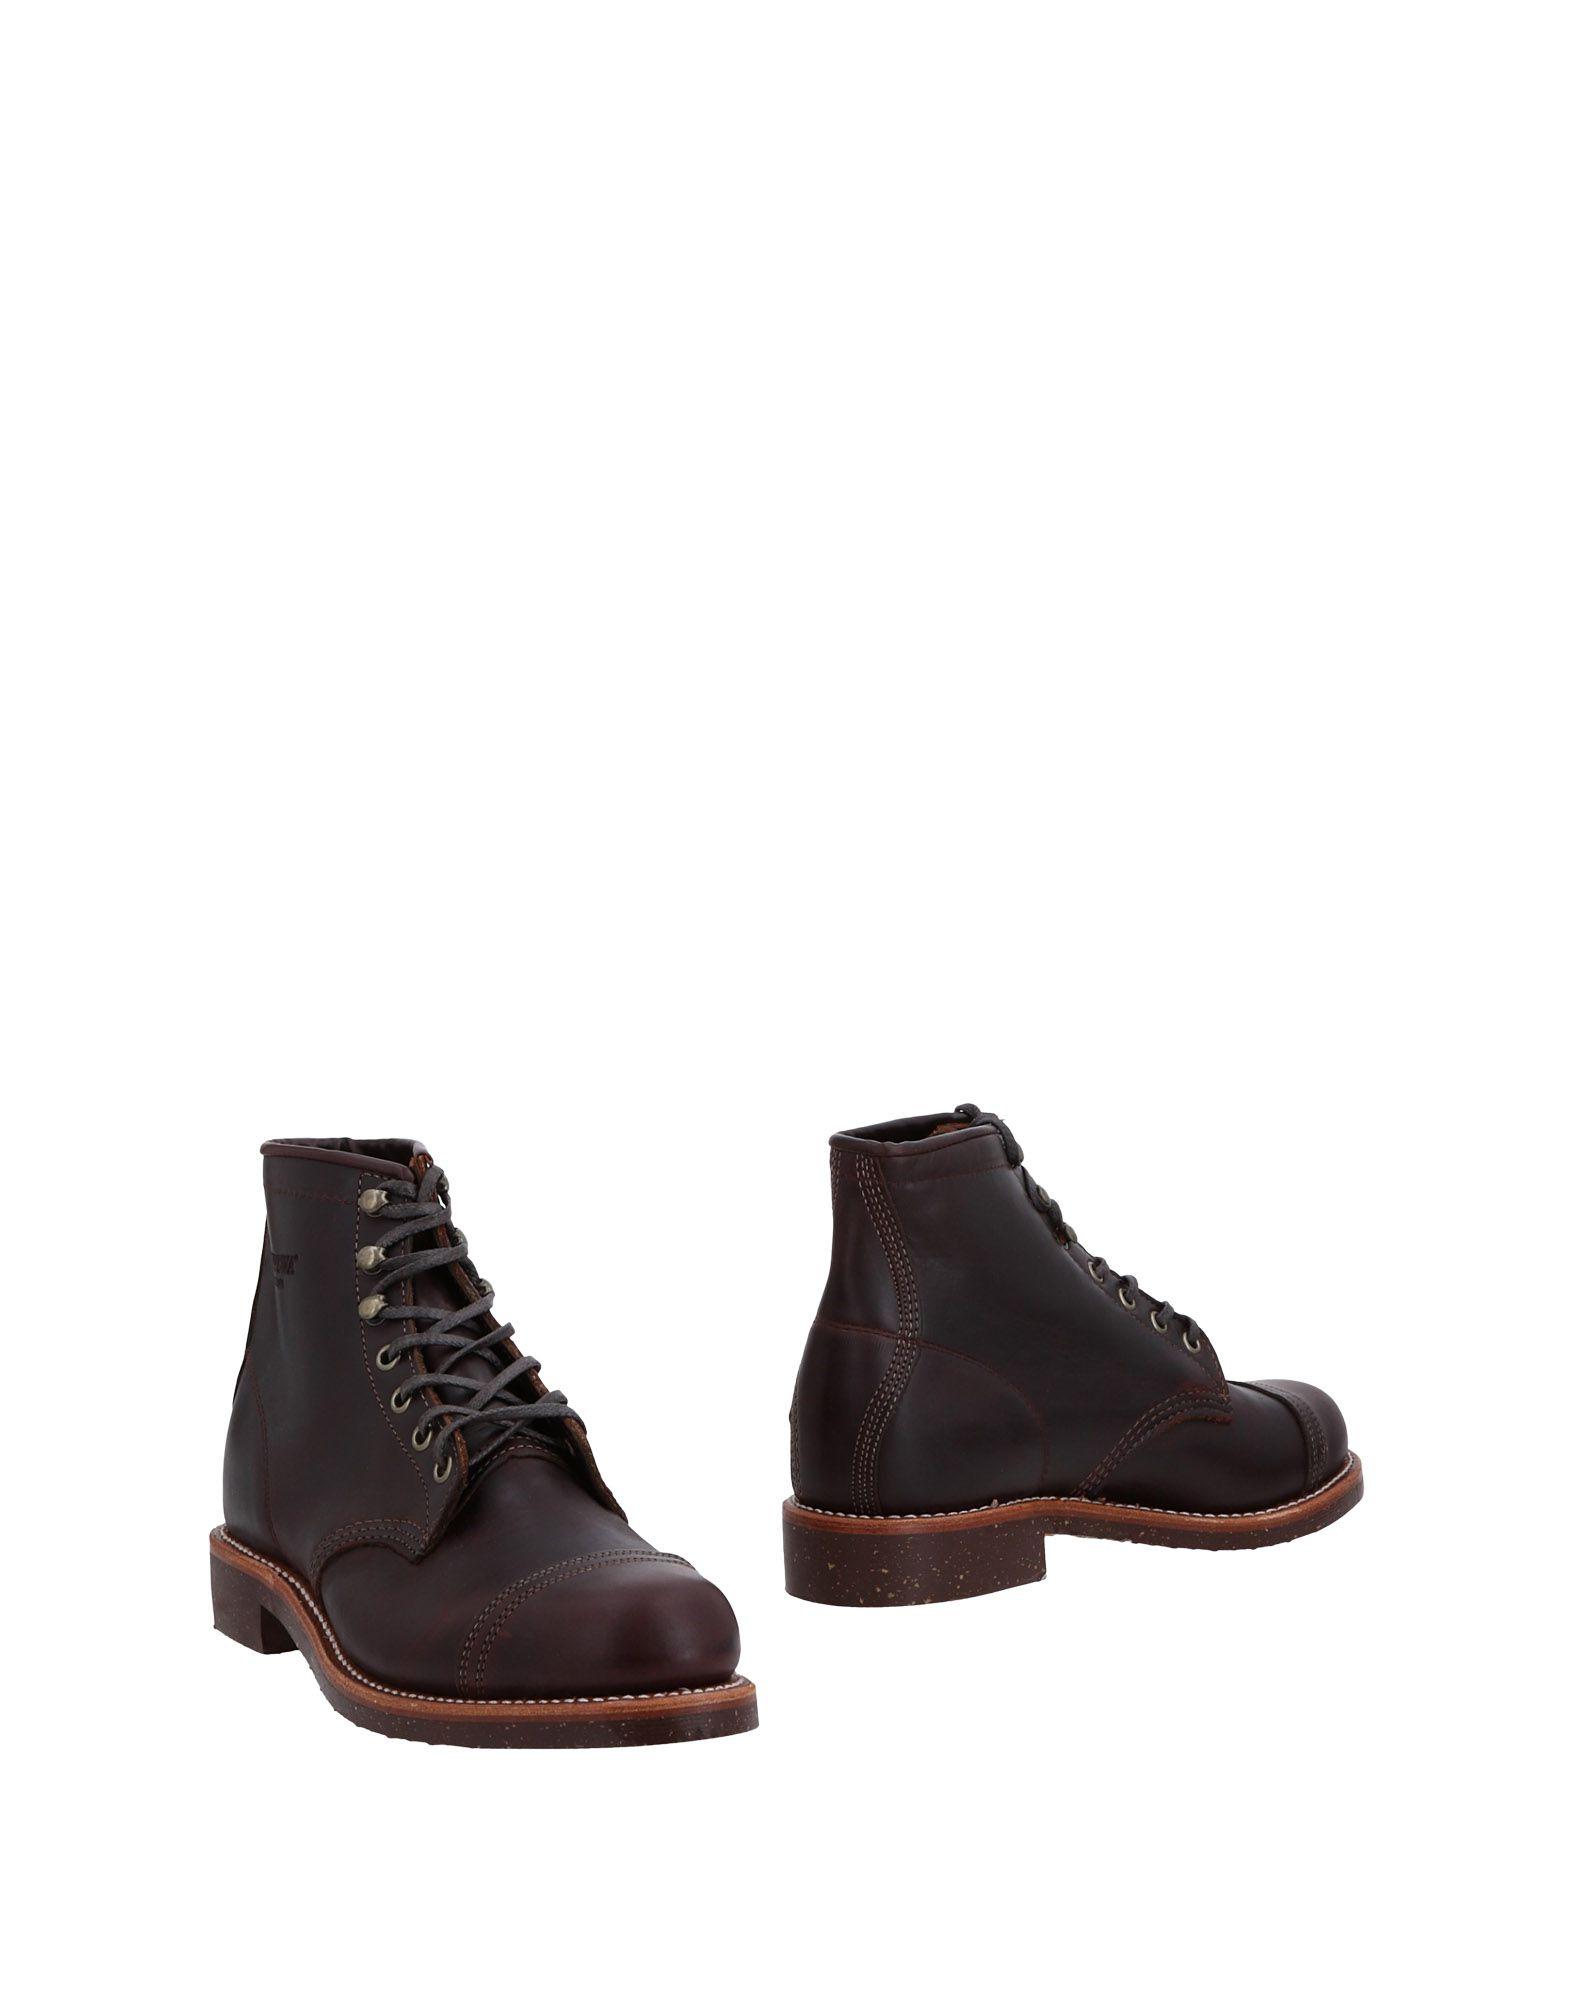 Chippewa on Boots - Men Chippewa Boots online on Chippewa  Canada - 11480132AD d89682